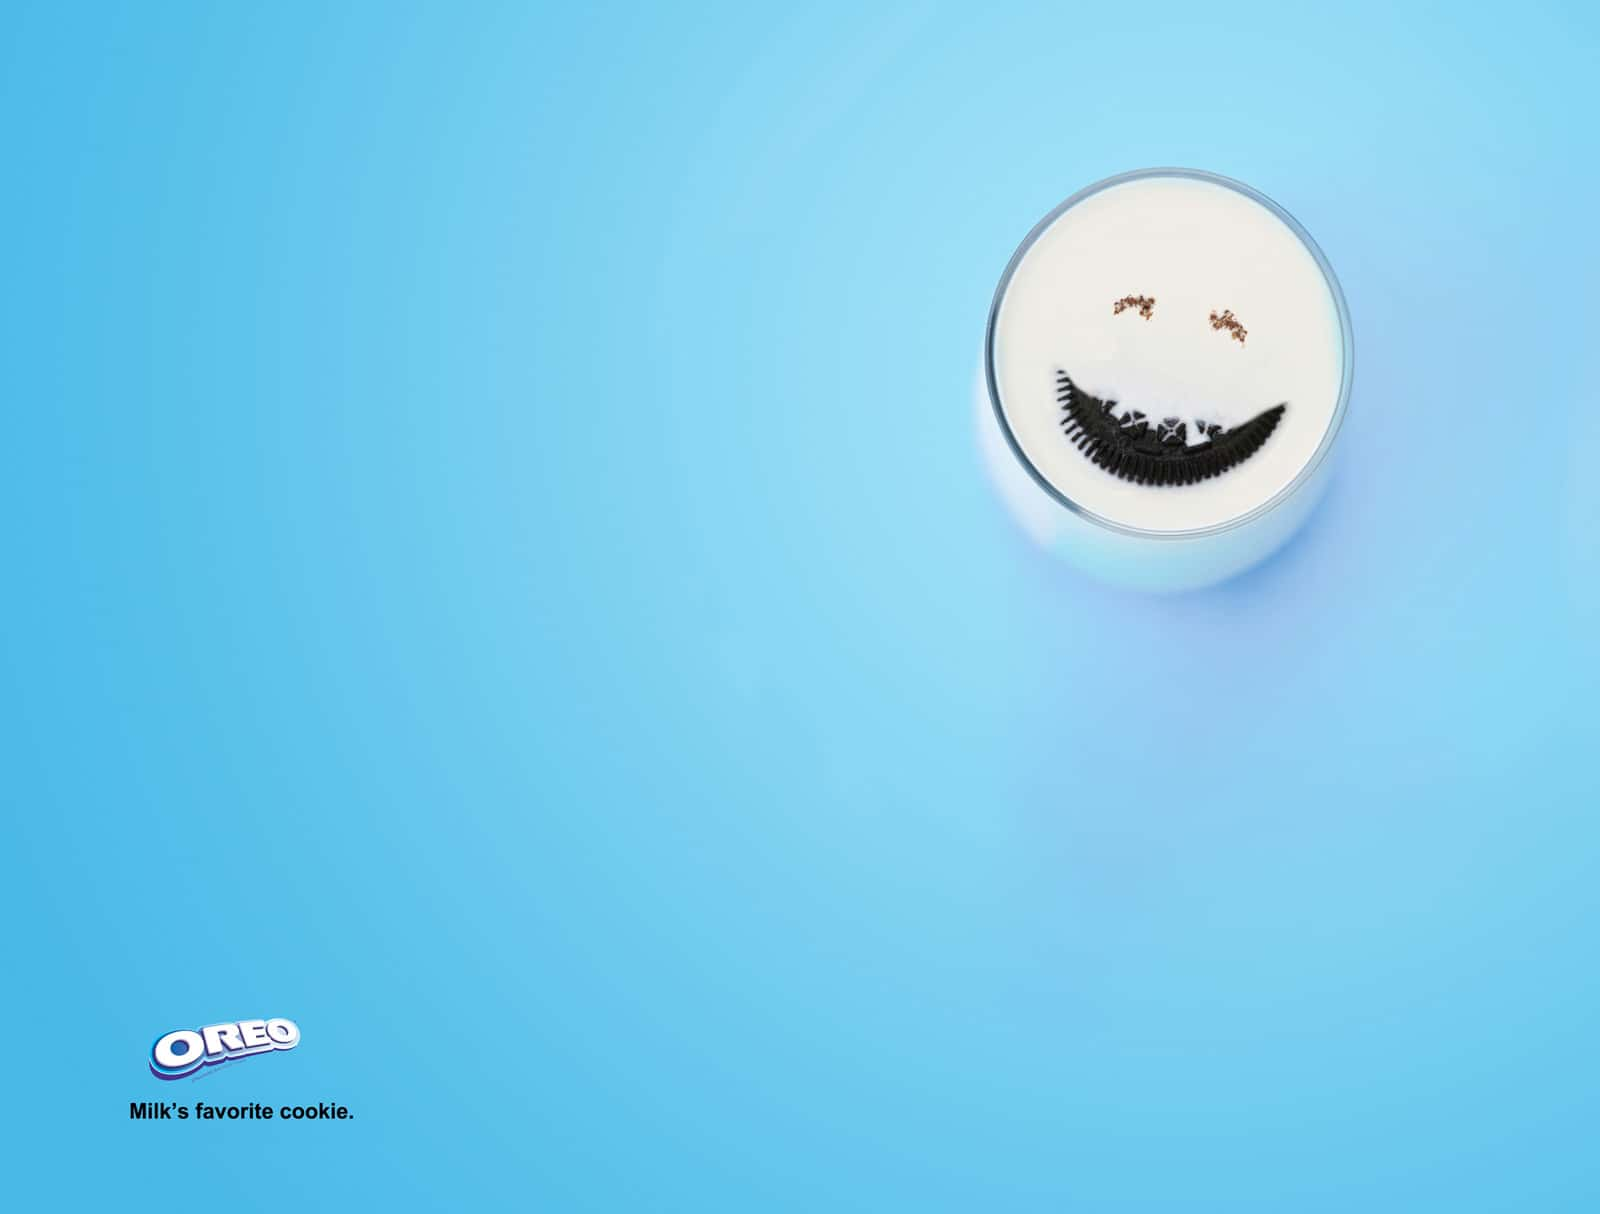 Oreo lait sourire